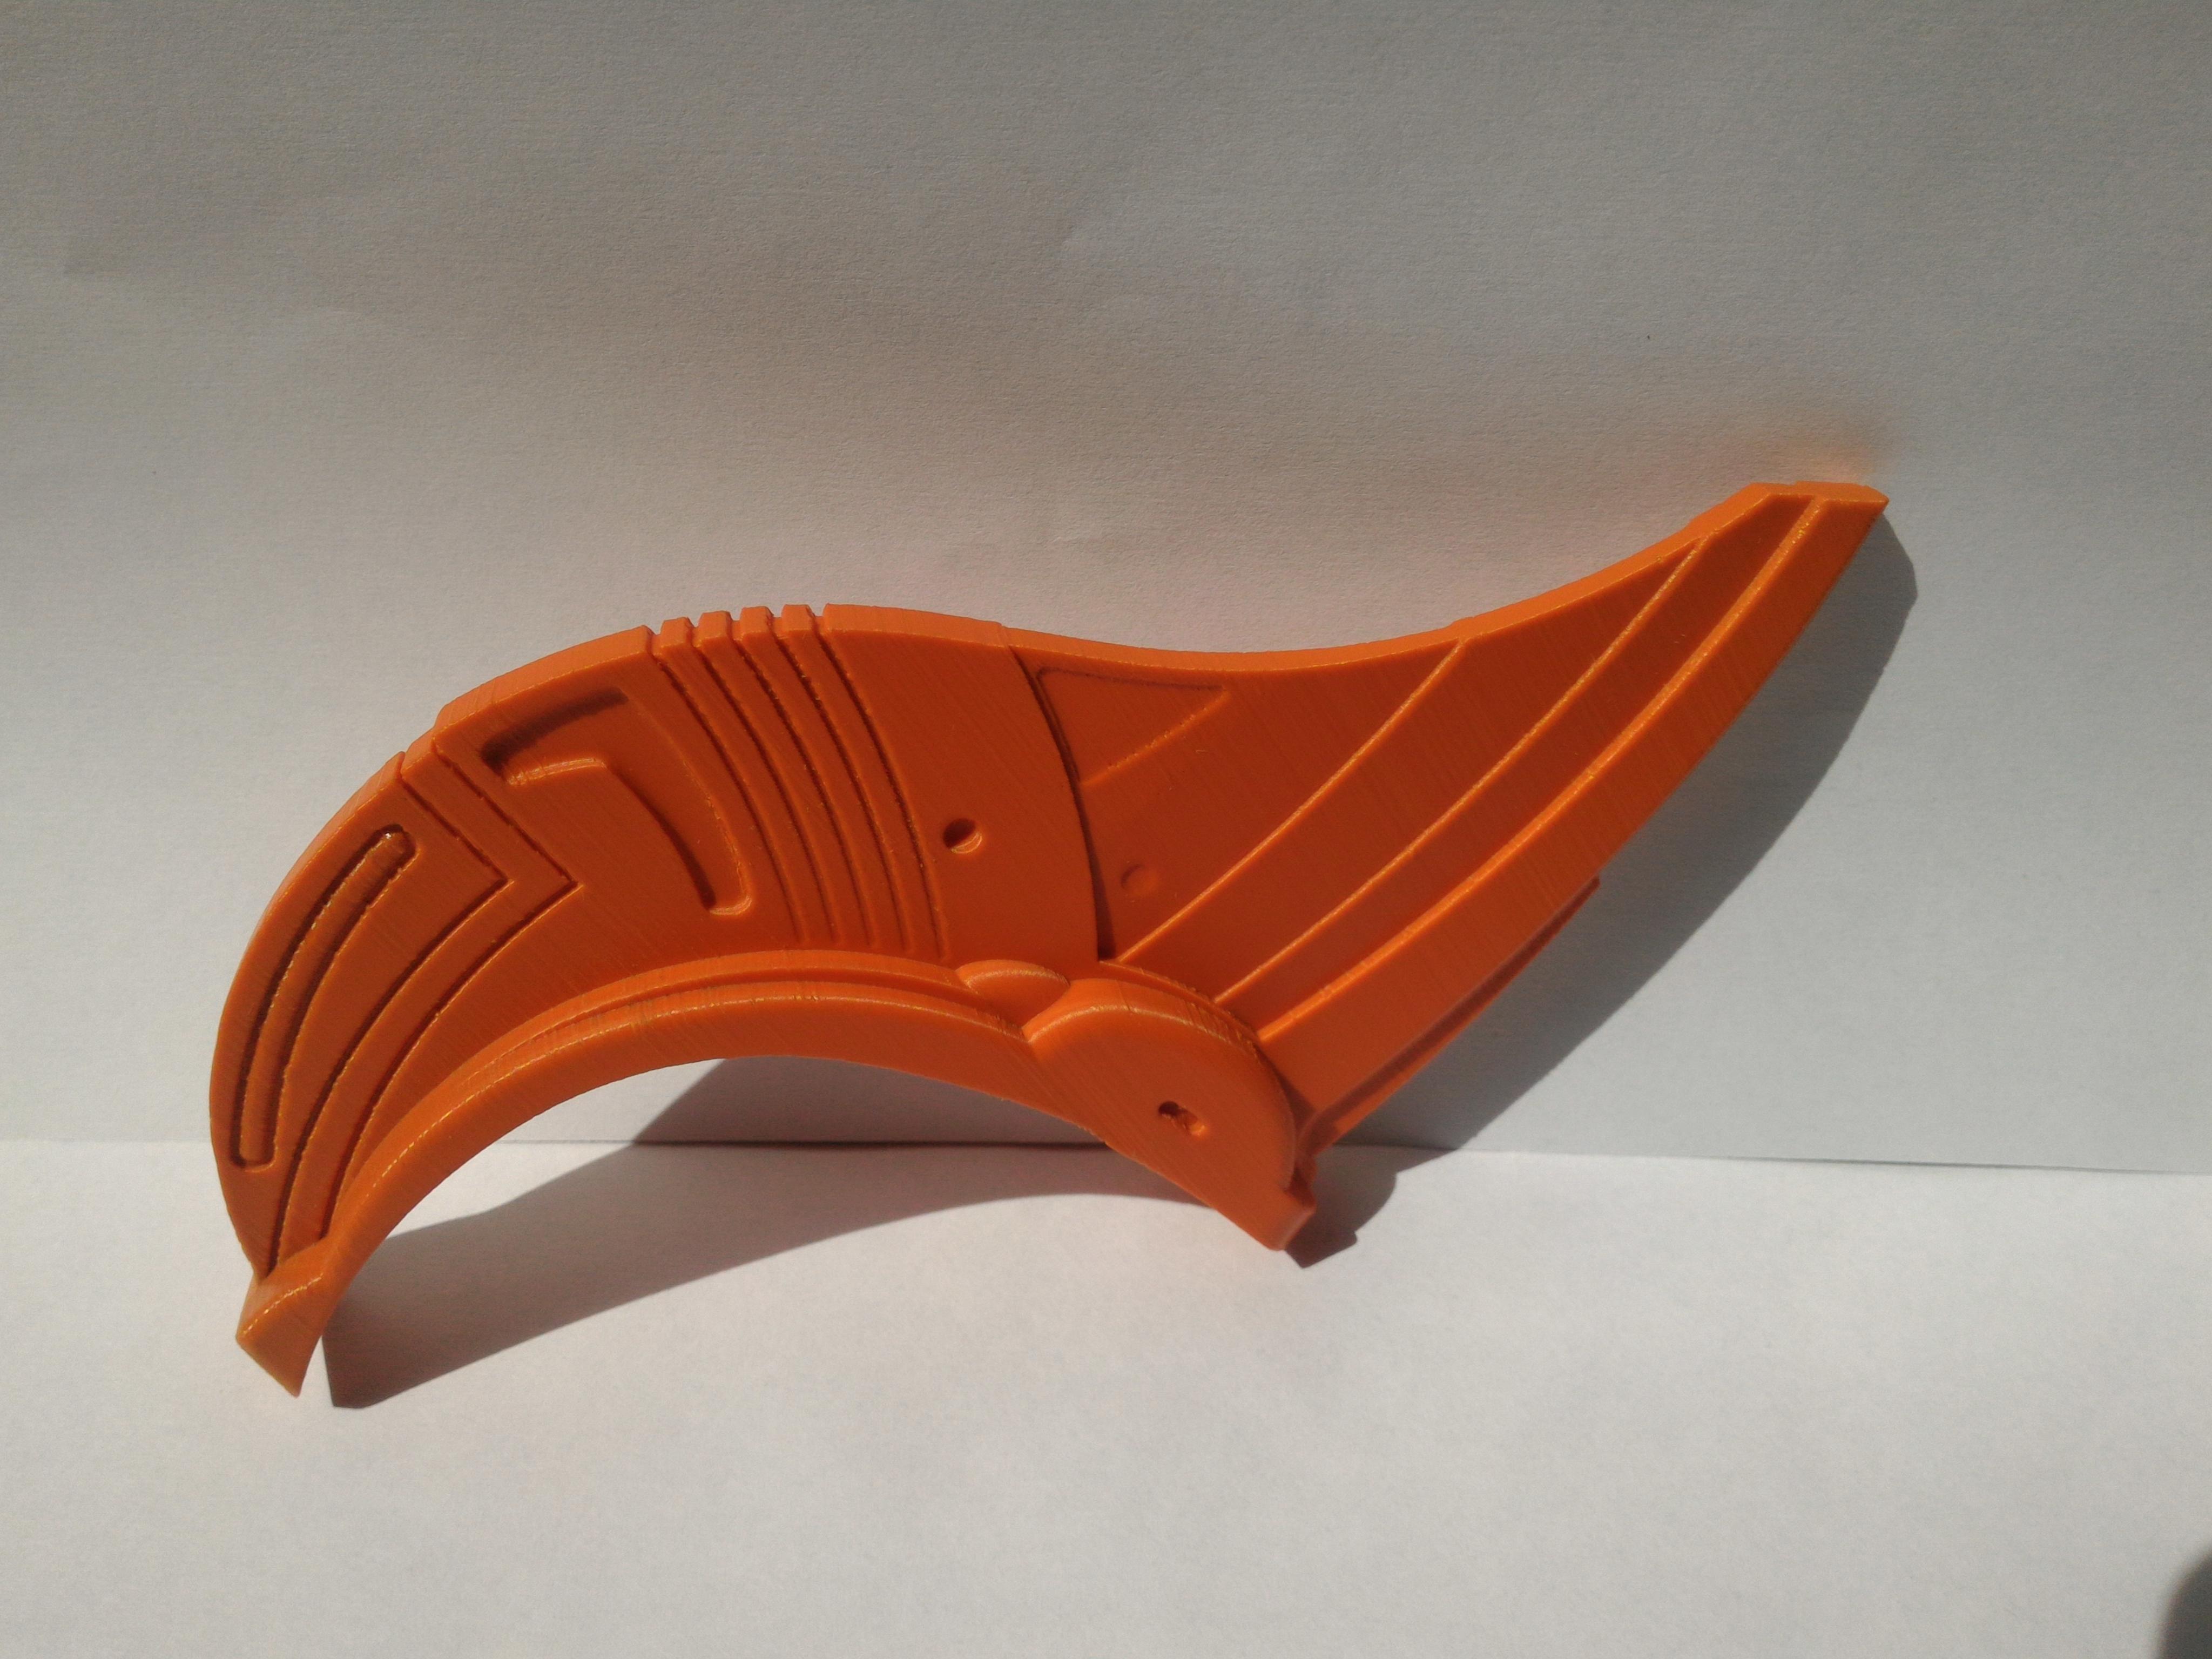 Yondu - Prototype Fin image